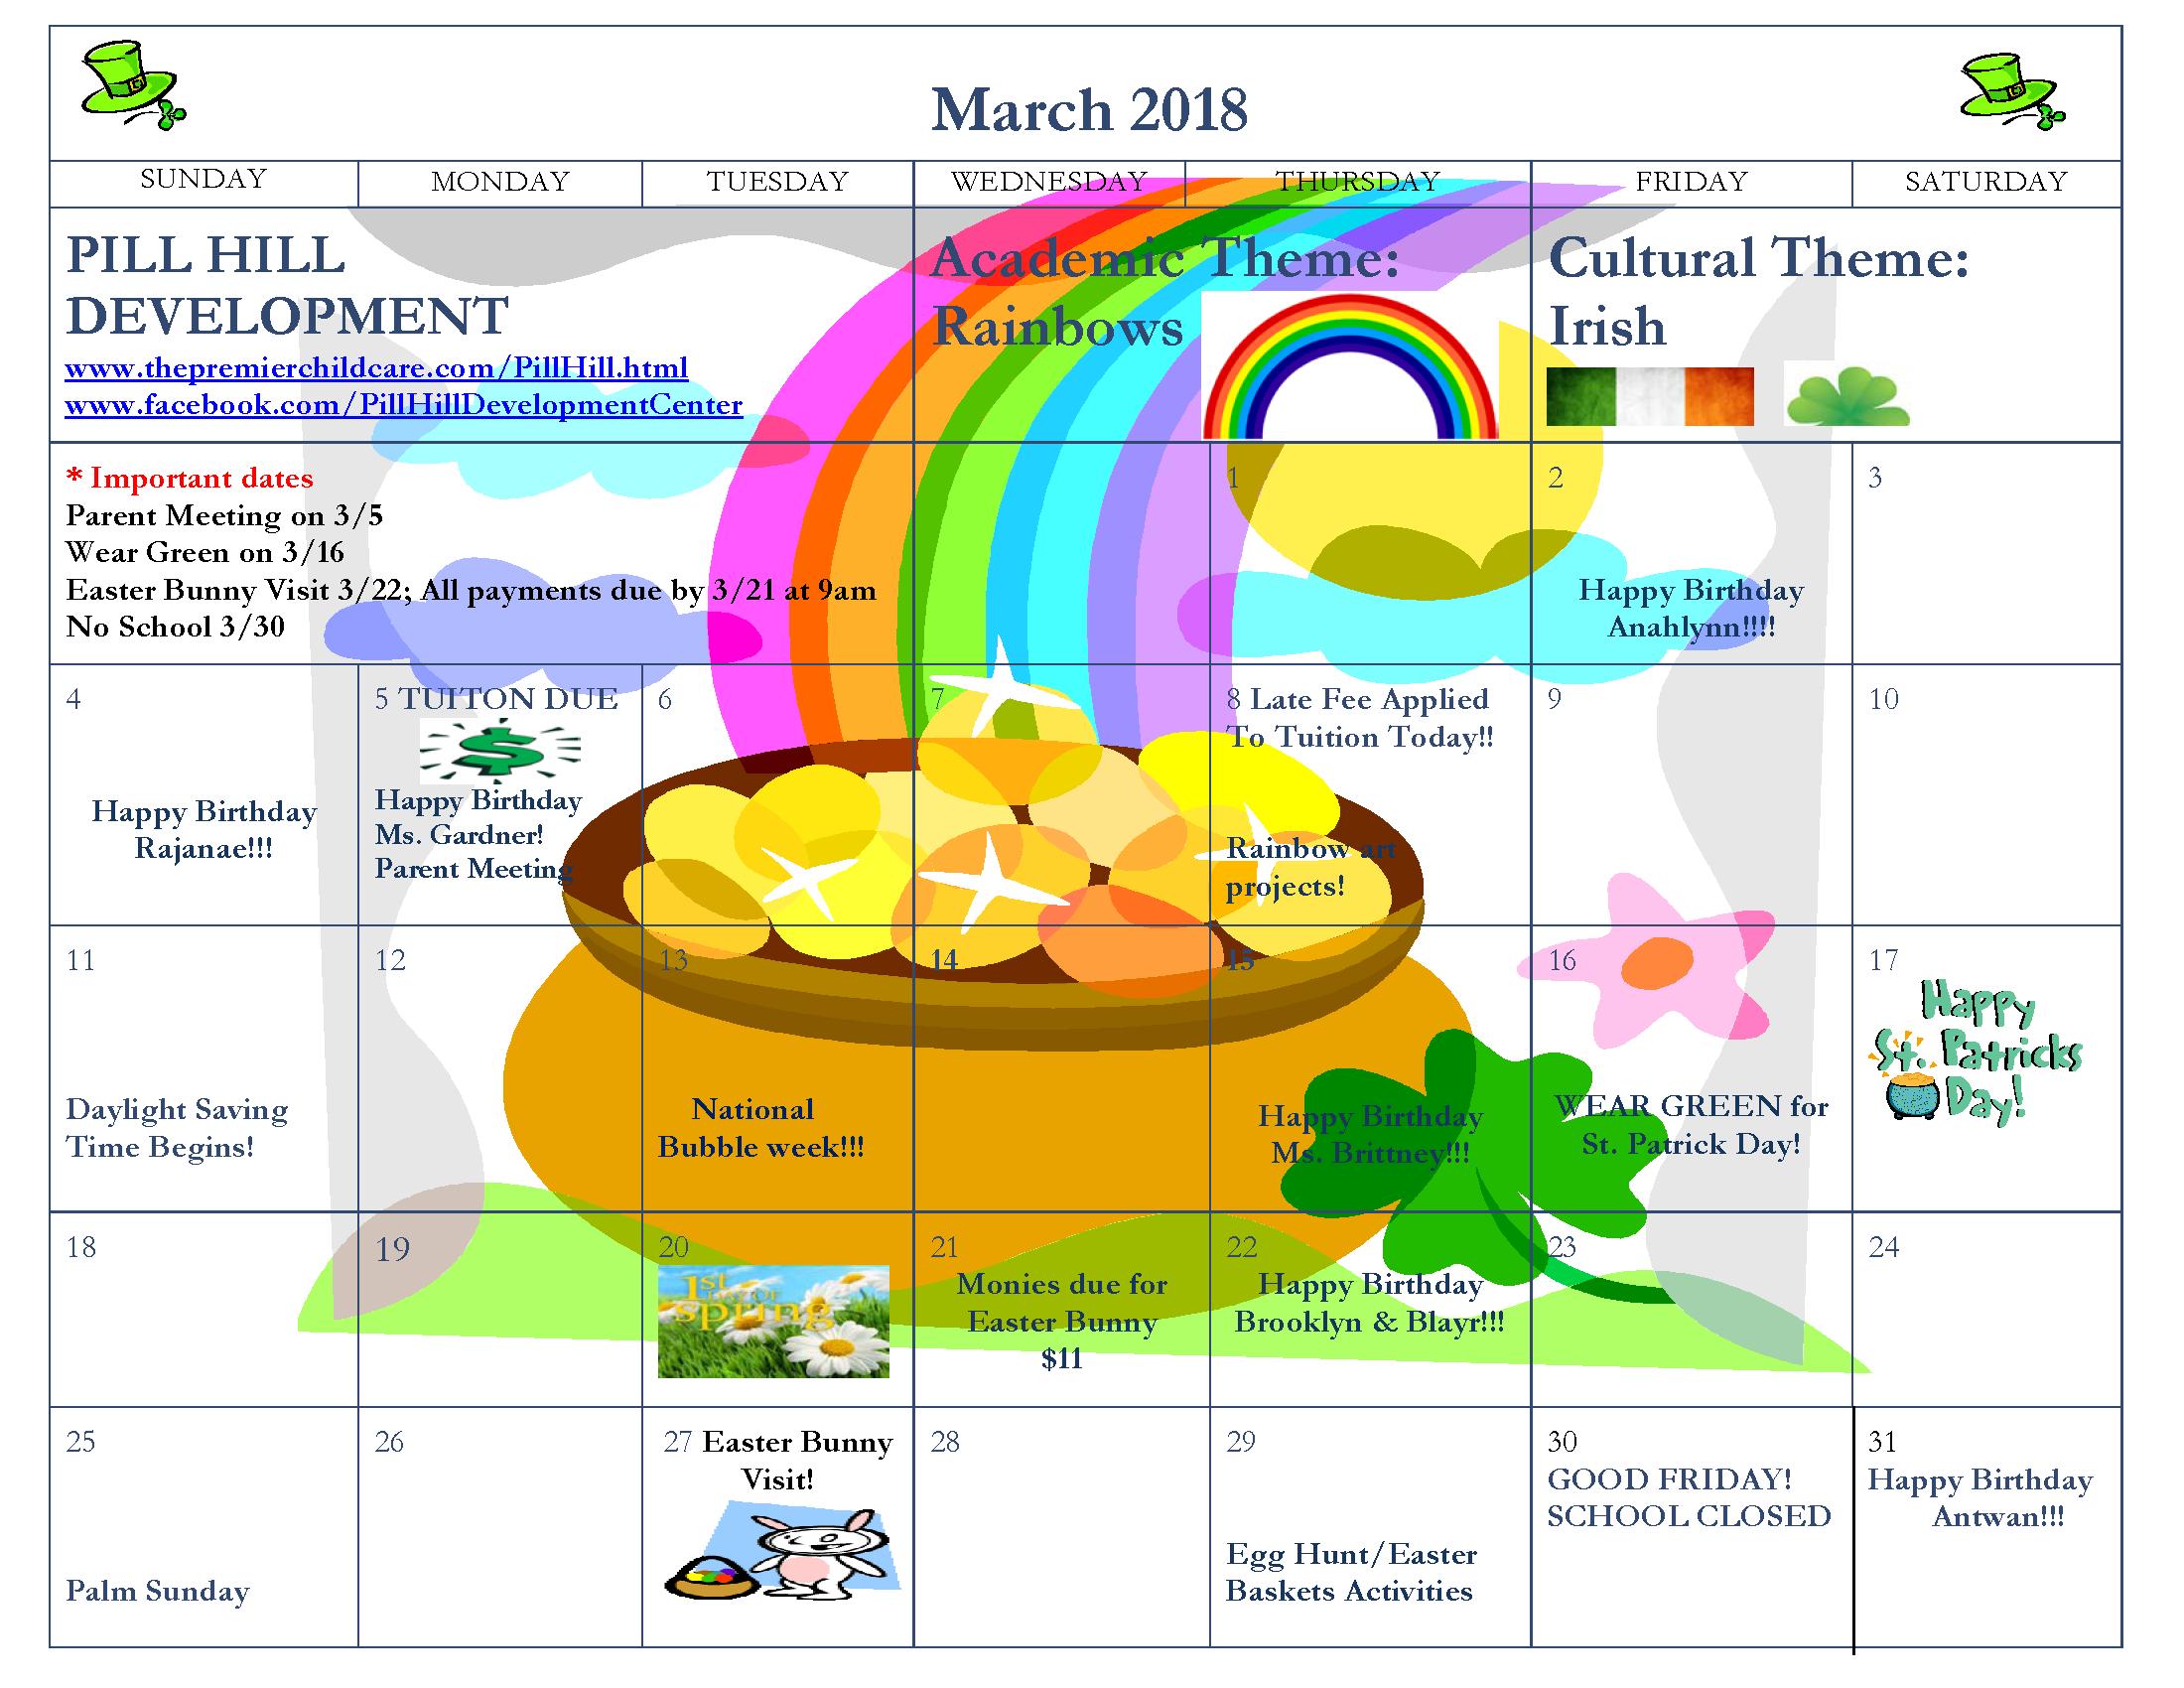 ph march 2018 calendar